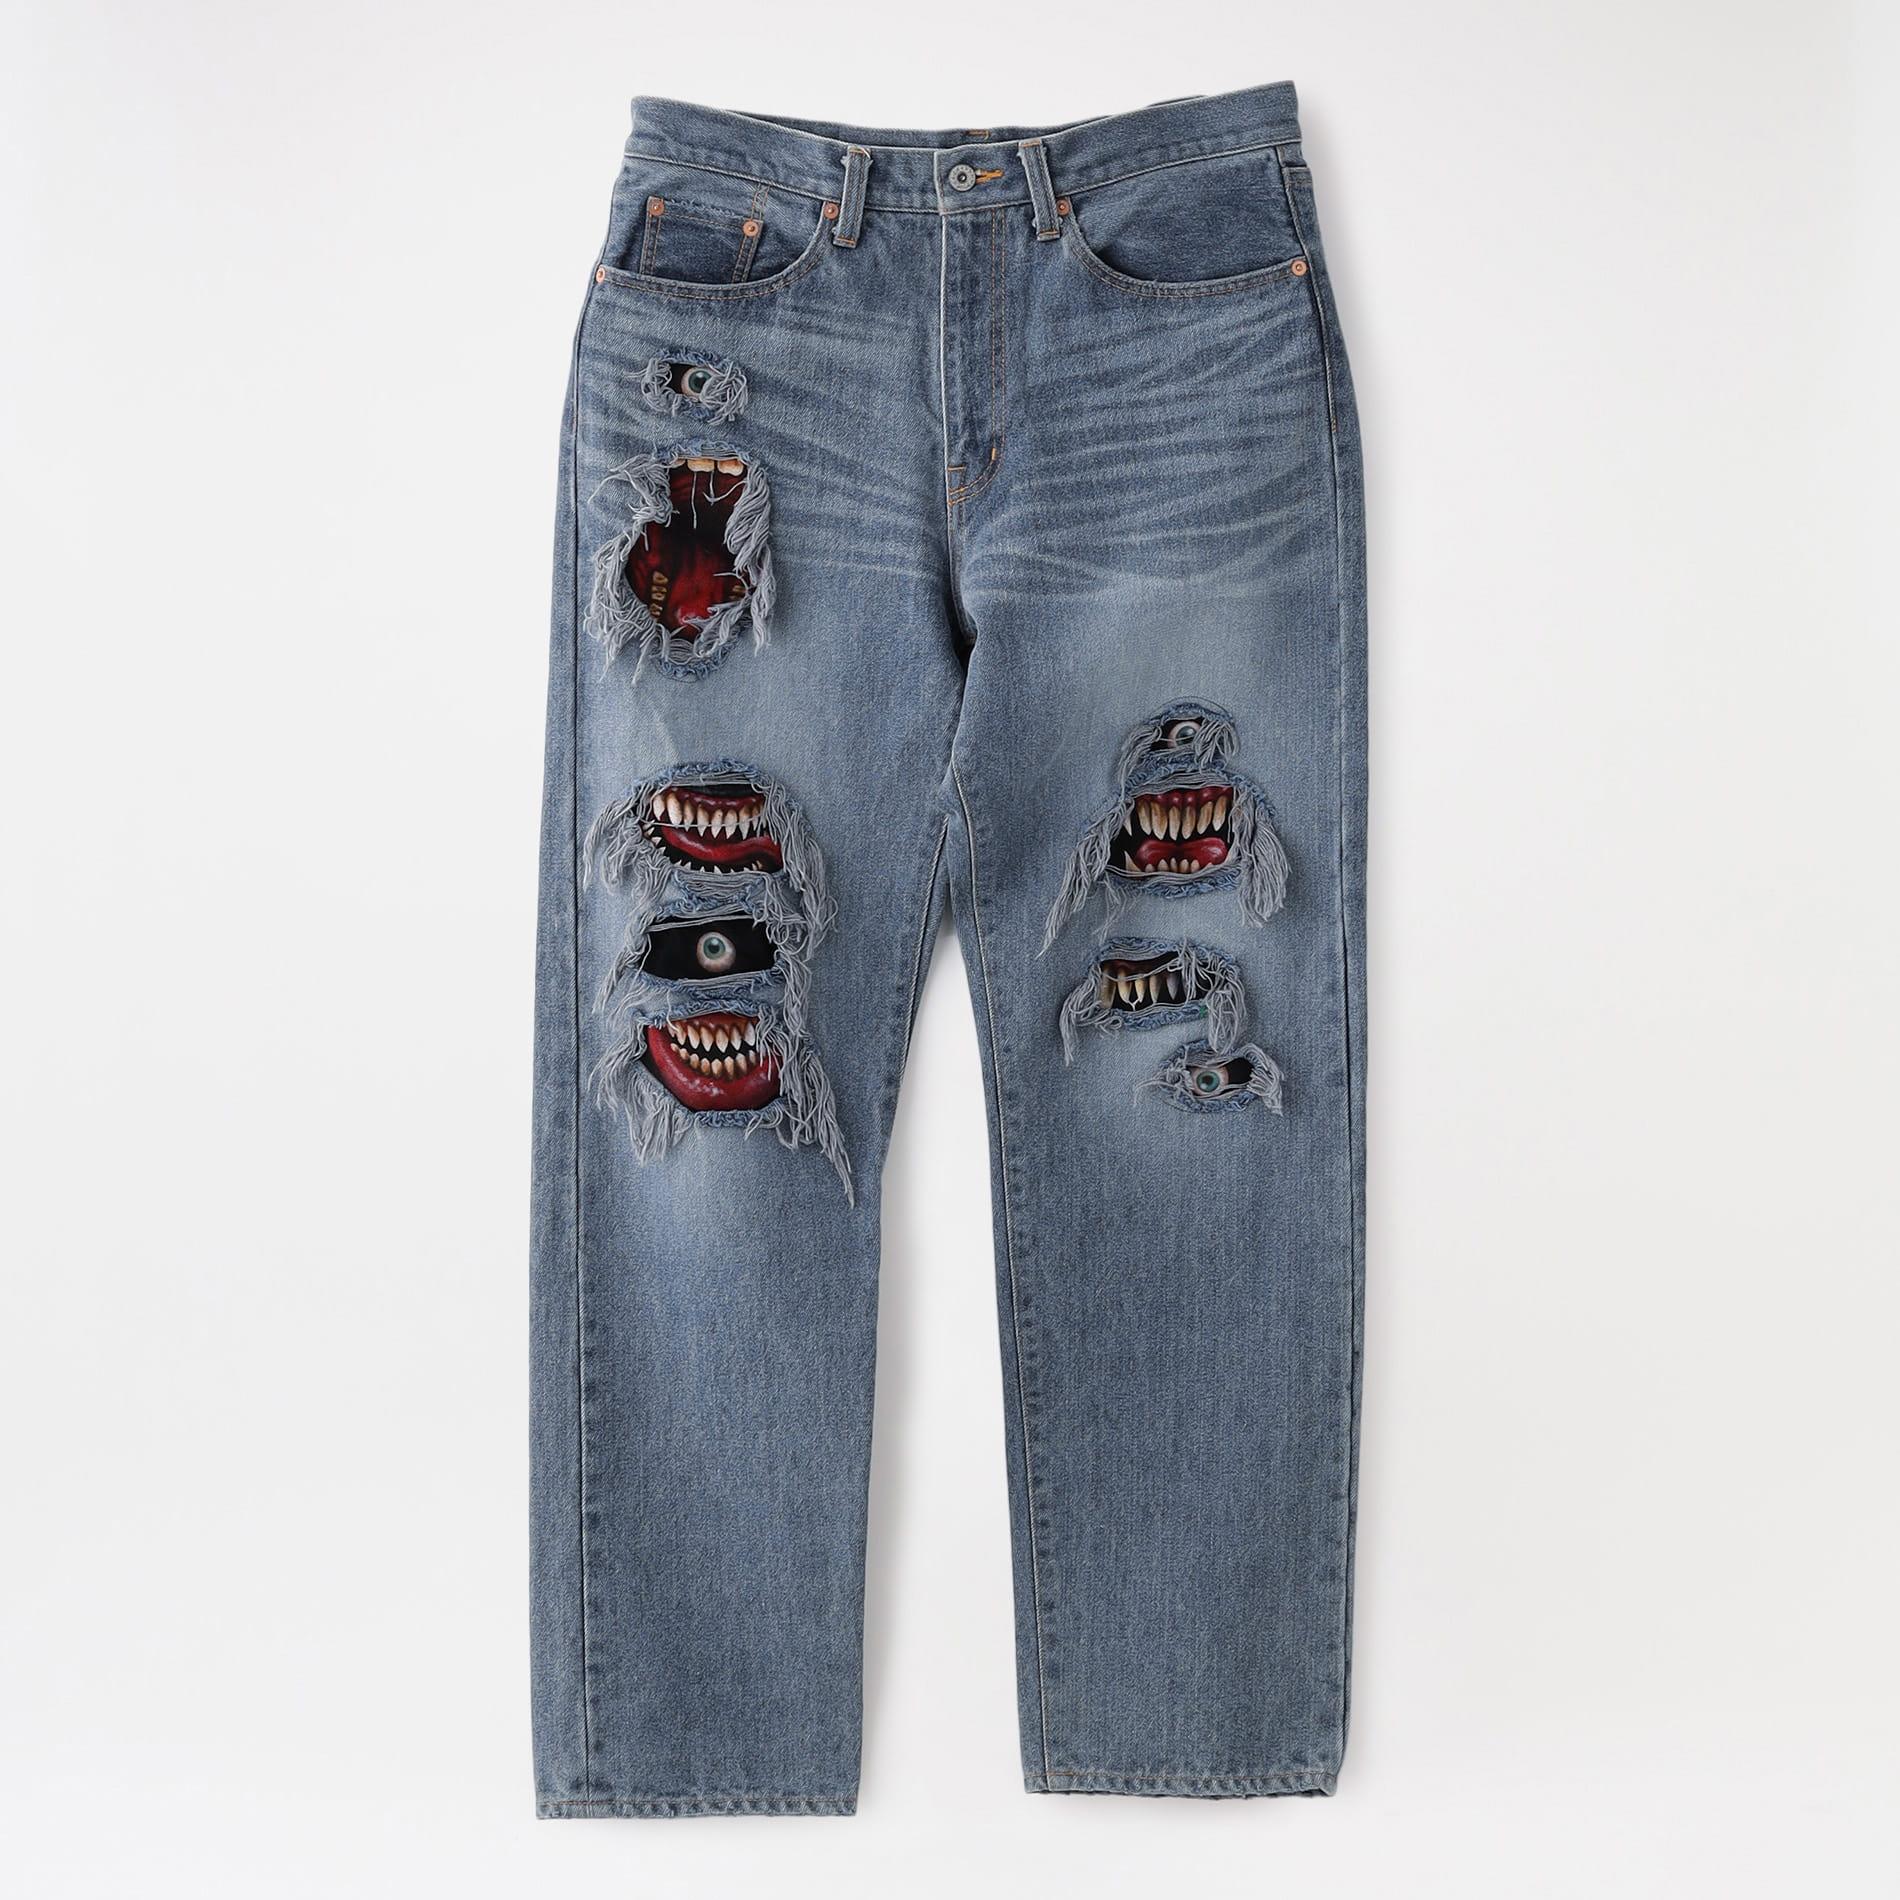 【doublet】MEN デニム RECYCLE DENIM MONSTER REPAIR PANTS 21AW11PT160